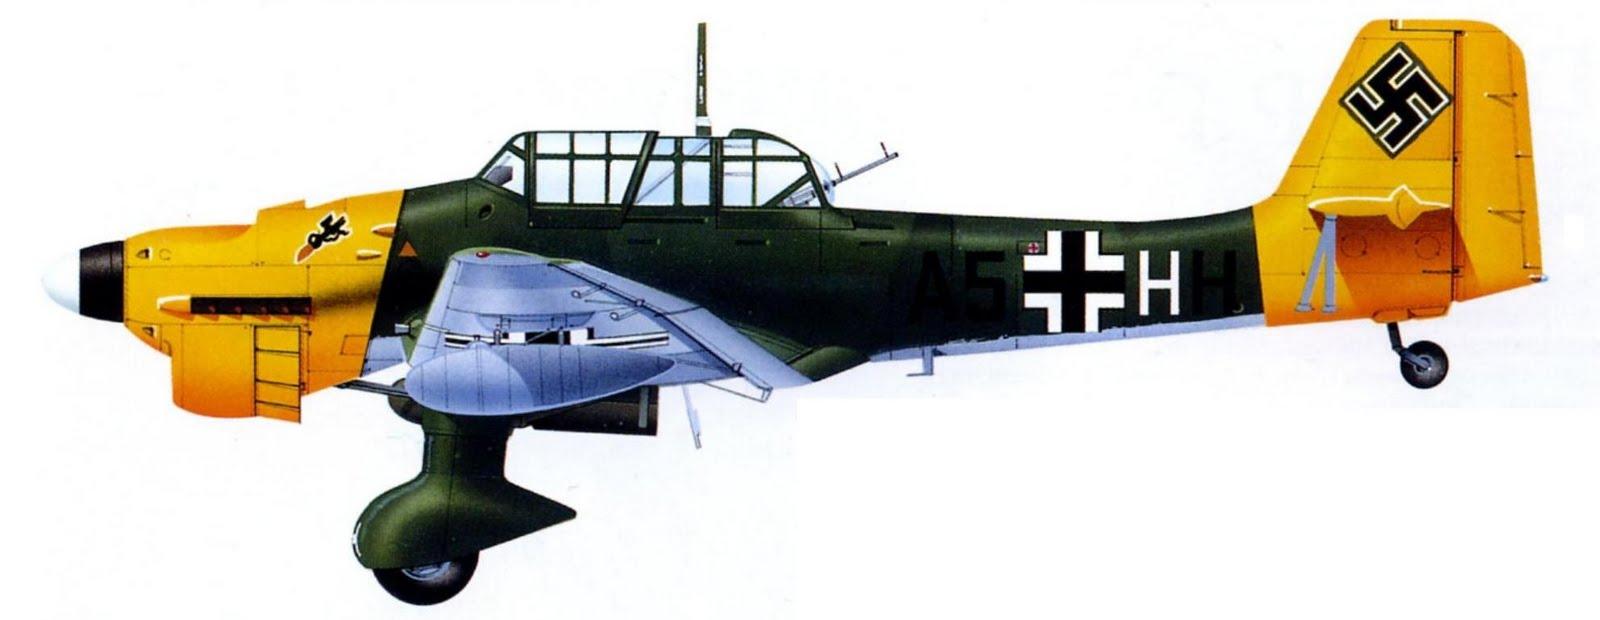 Юнкерc ju 87r 2 из 1 stg 1 1 й эскадрильи 1 го